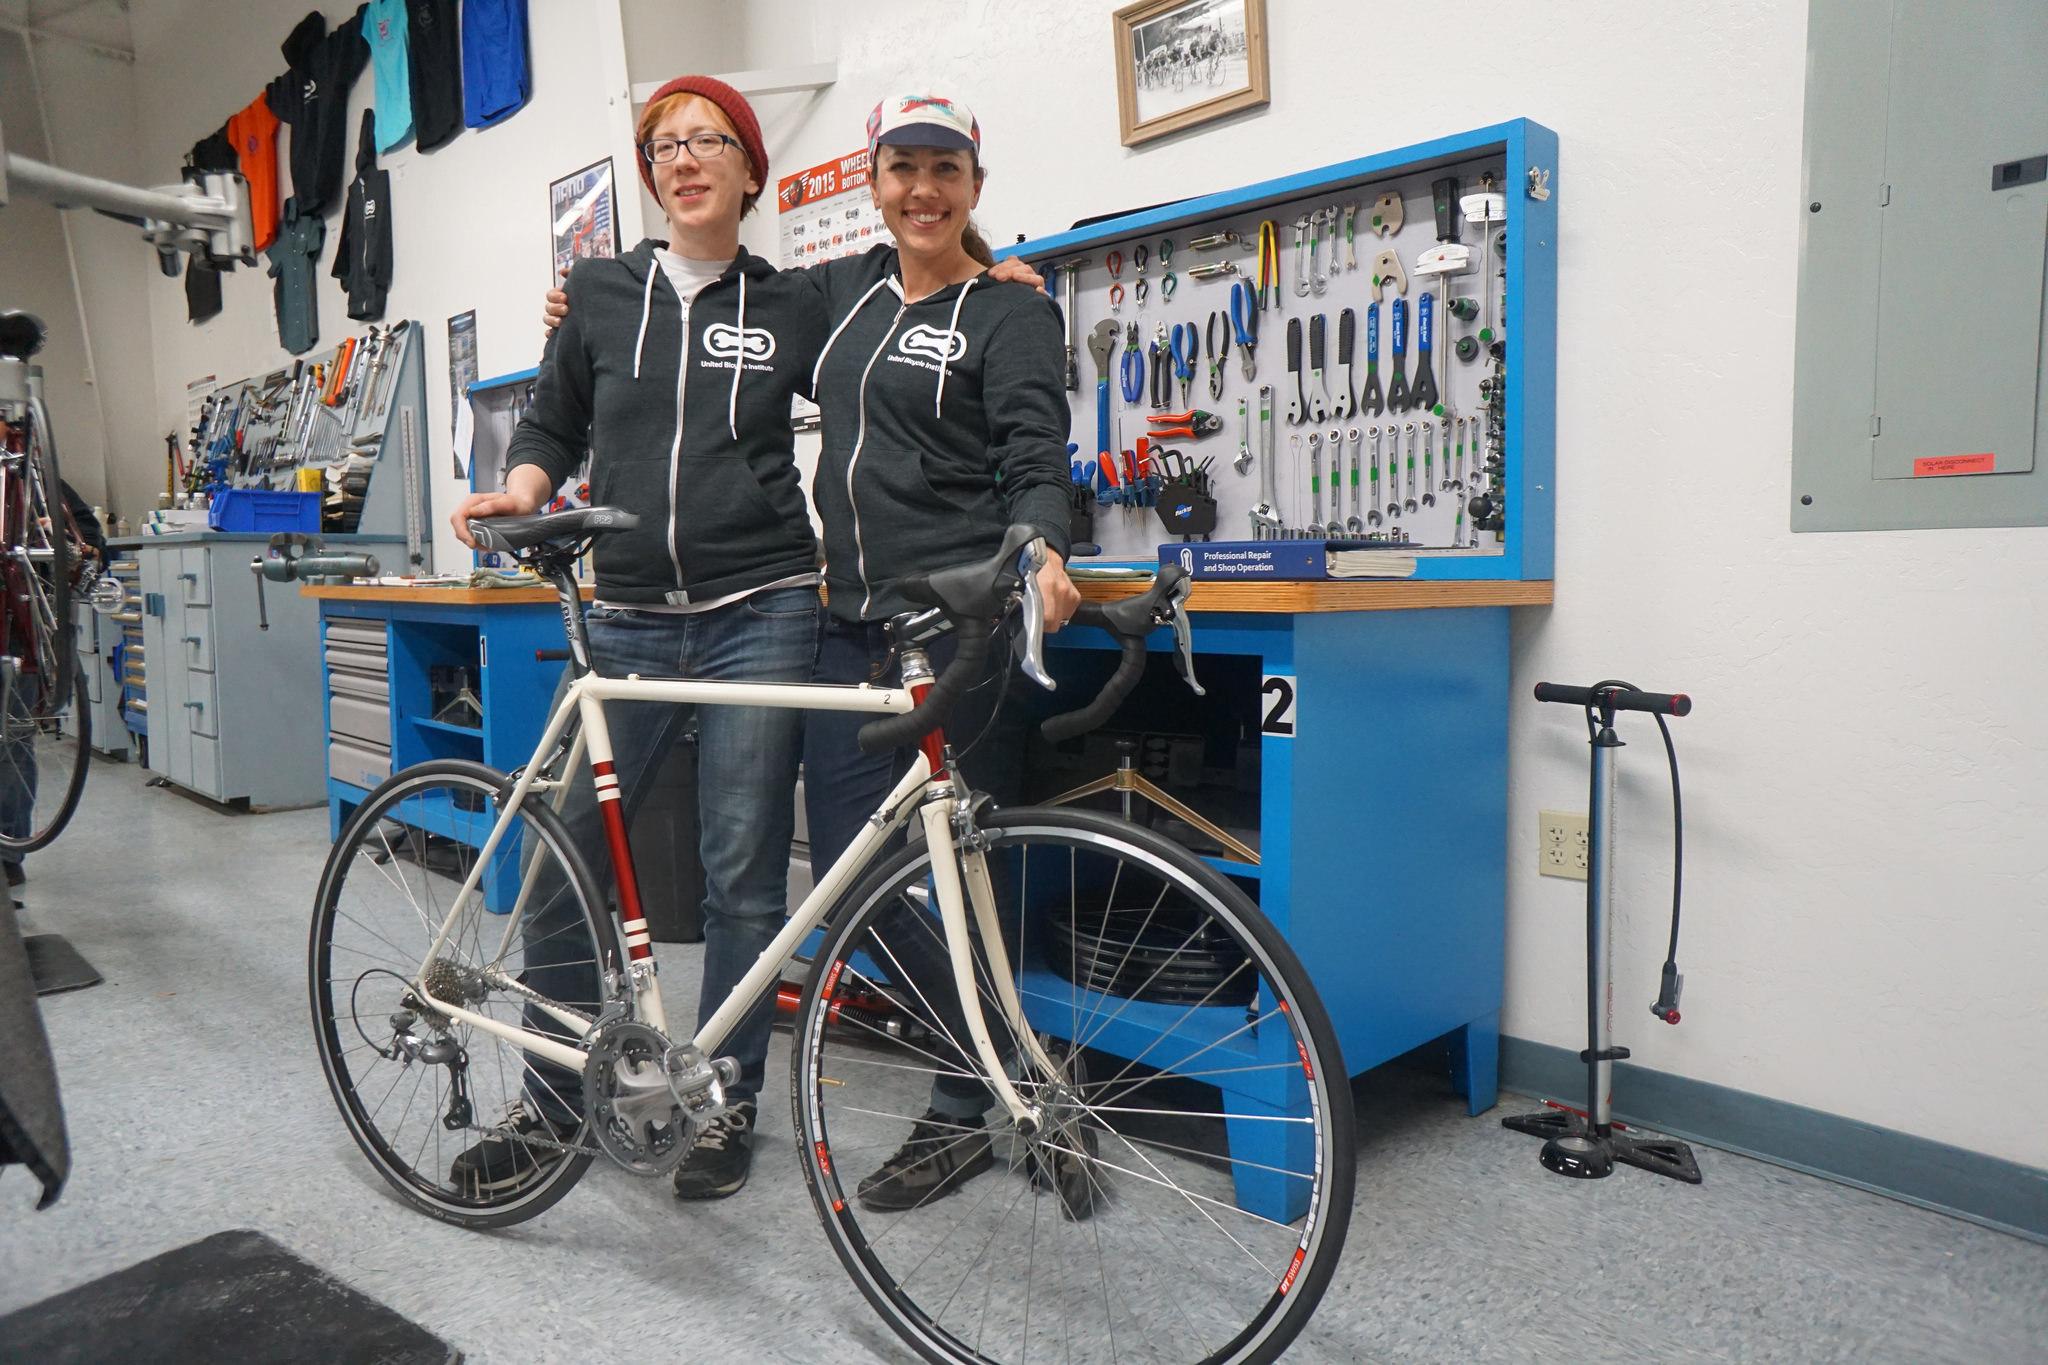 Amanda Resch of Legend Bicycles and Nicole Davison of Veloville USA